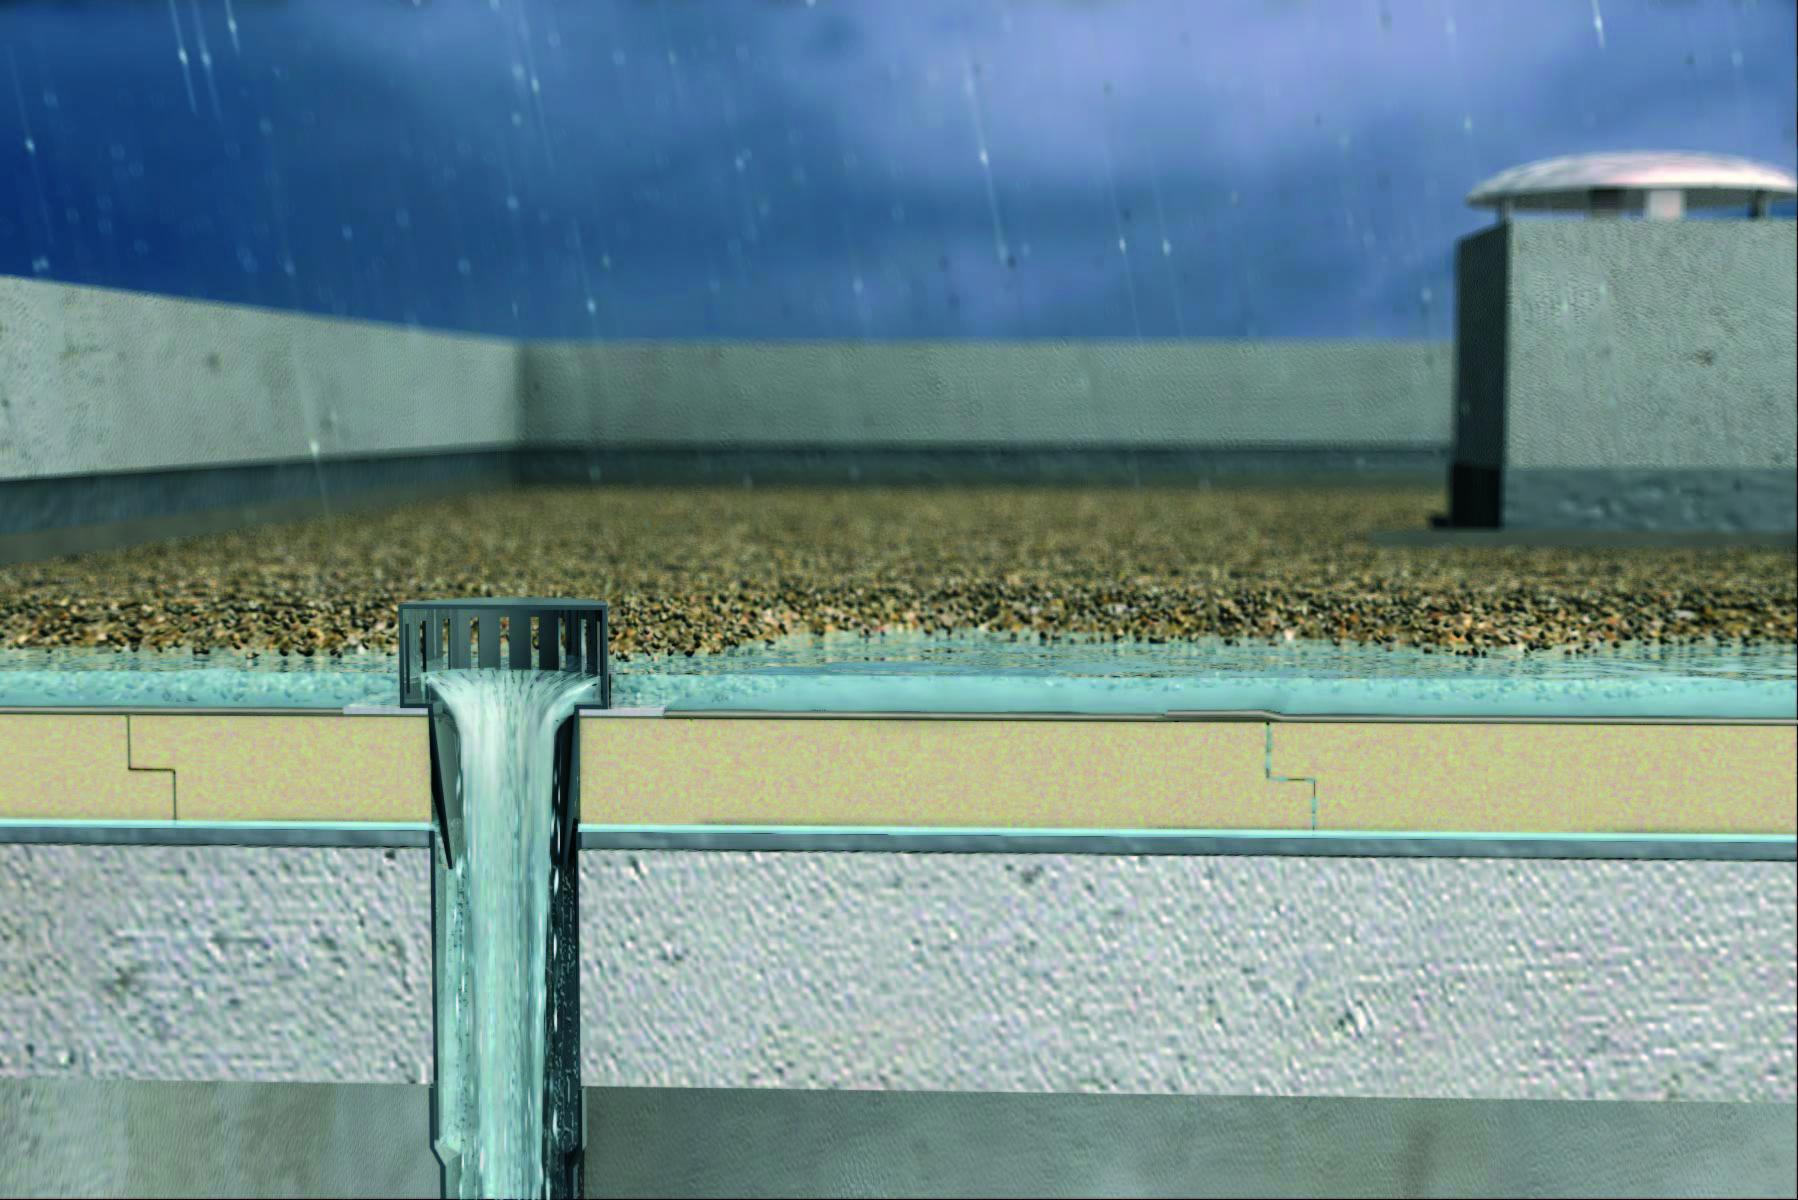 Toitures terrasses ursa for Isolation exterieur xps